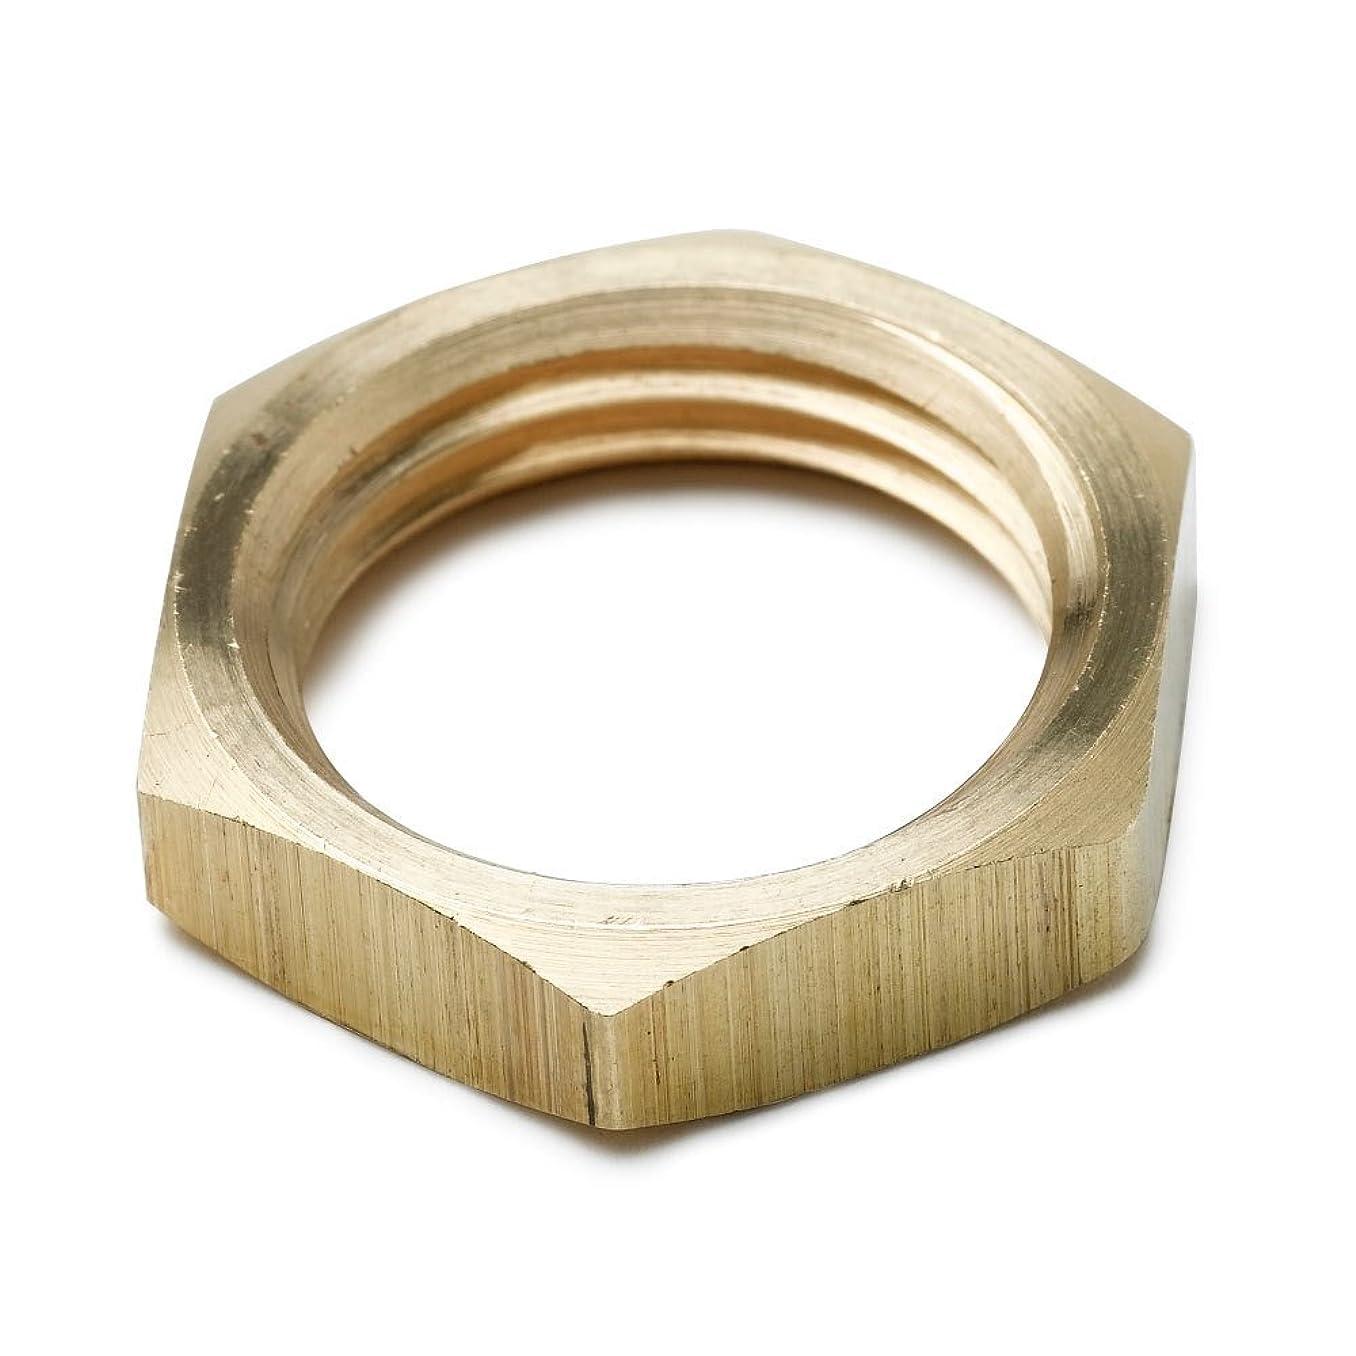 Tompkins 3120-12 Pipe Fitting, Pipe Locknut, 3/4-14, Brass